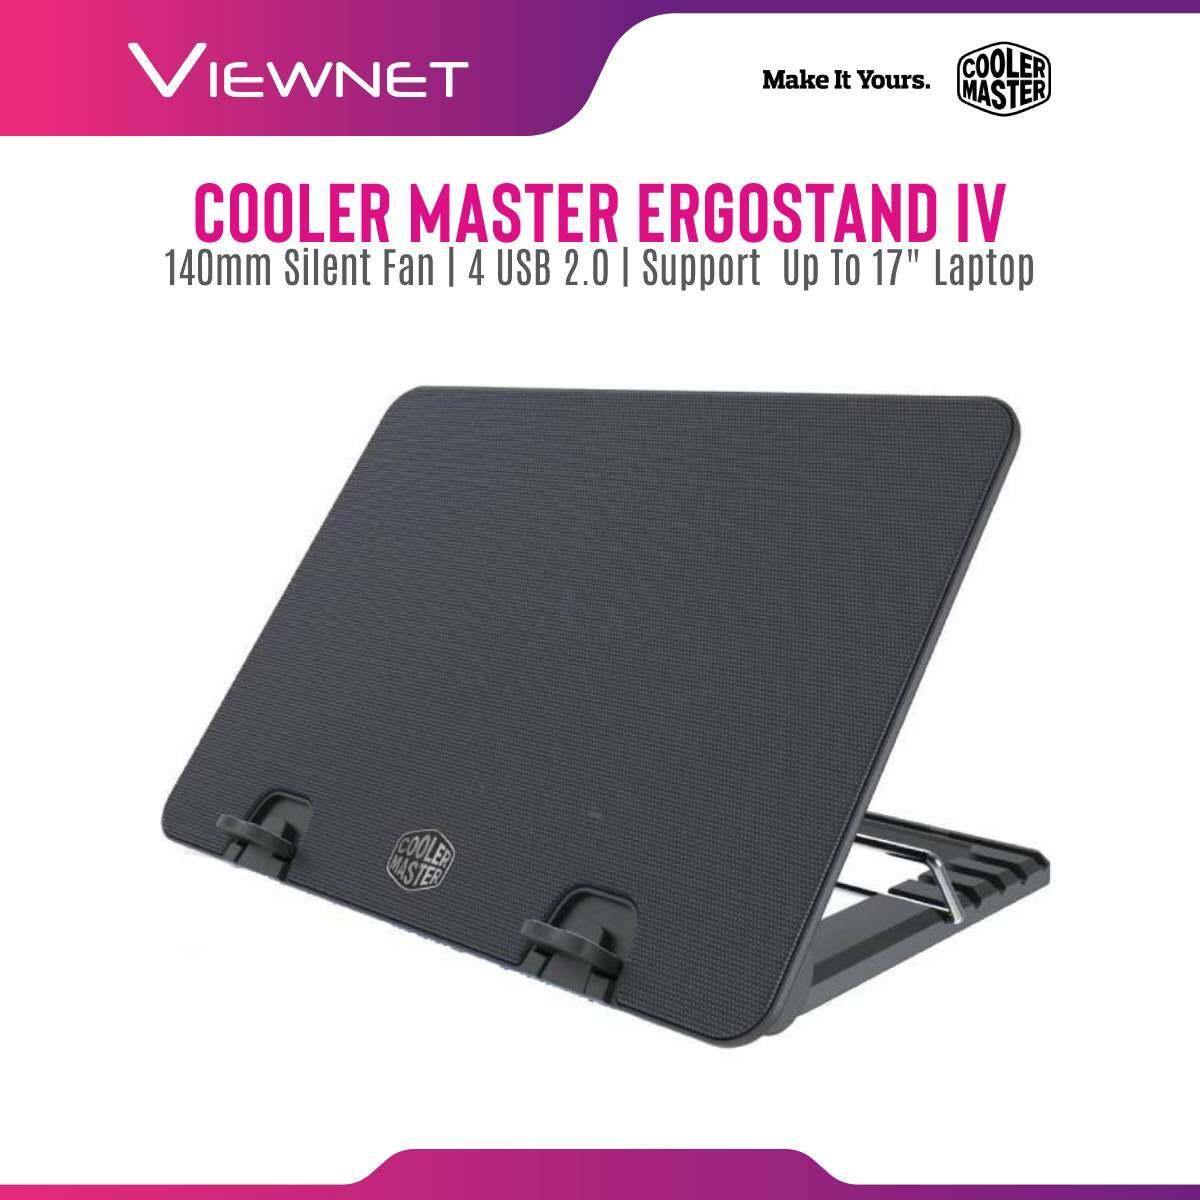 Cooler Master ERGOSTAND IV 140mm Silent Fan Height-Adjustable Ergonomic Mesh 4 USB 2.0 Notebook Cooler for up to 17